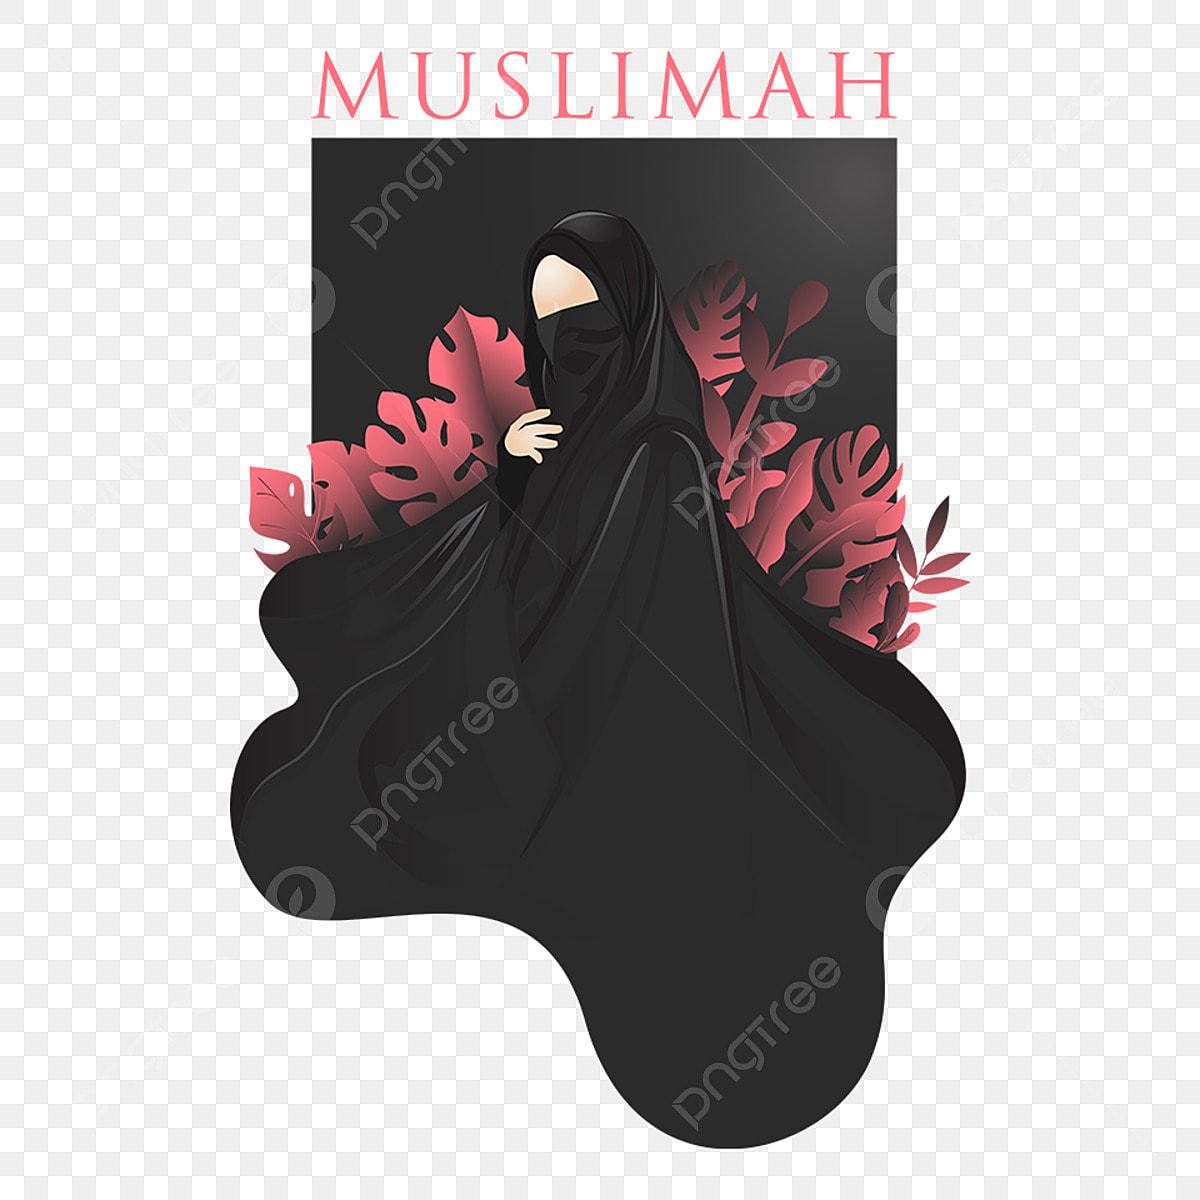 Kartun Muslimah PNG Vector And PSD Files